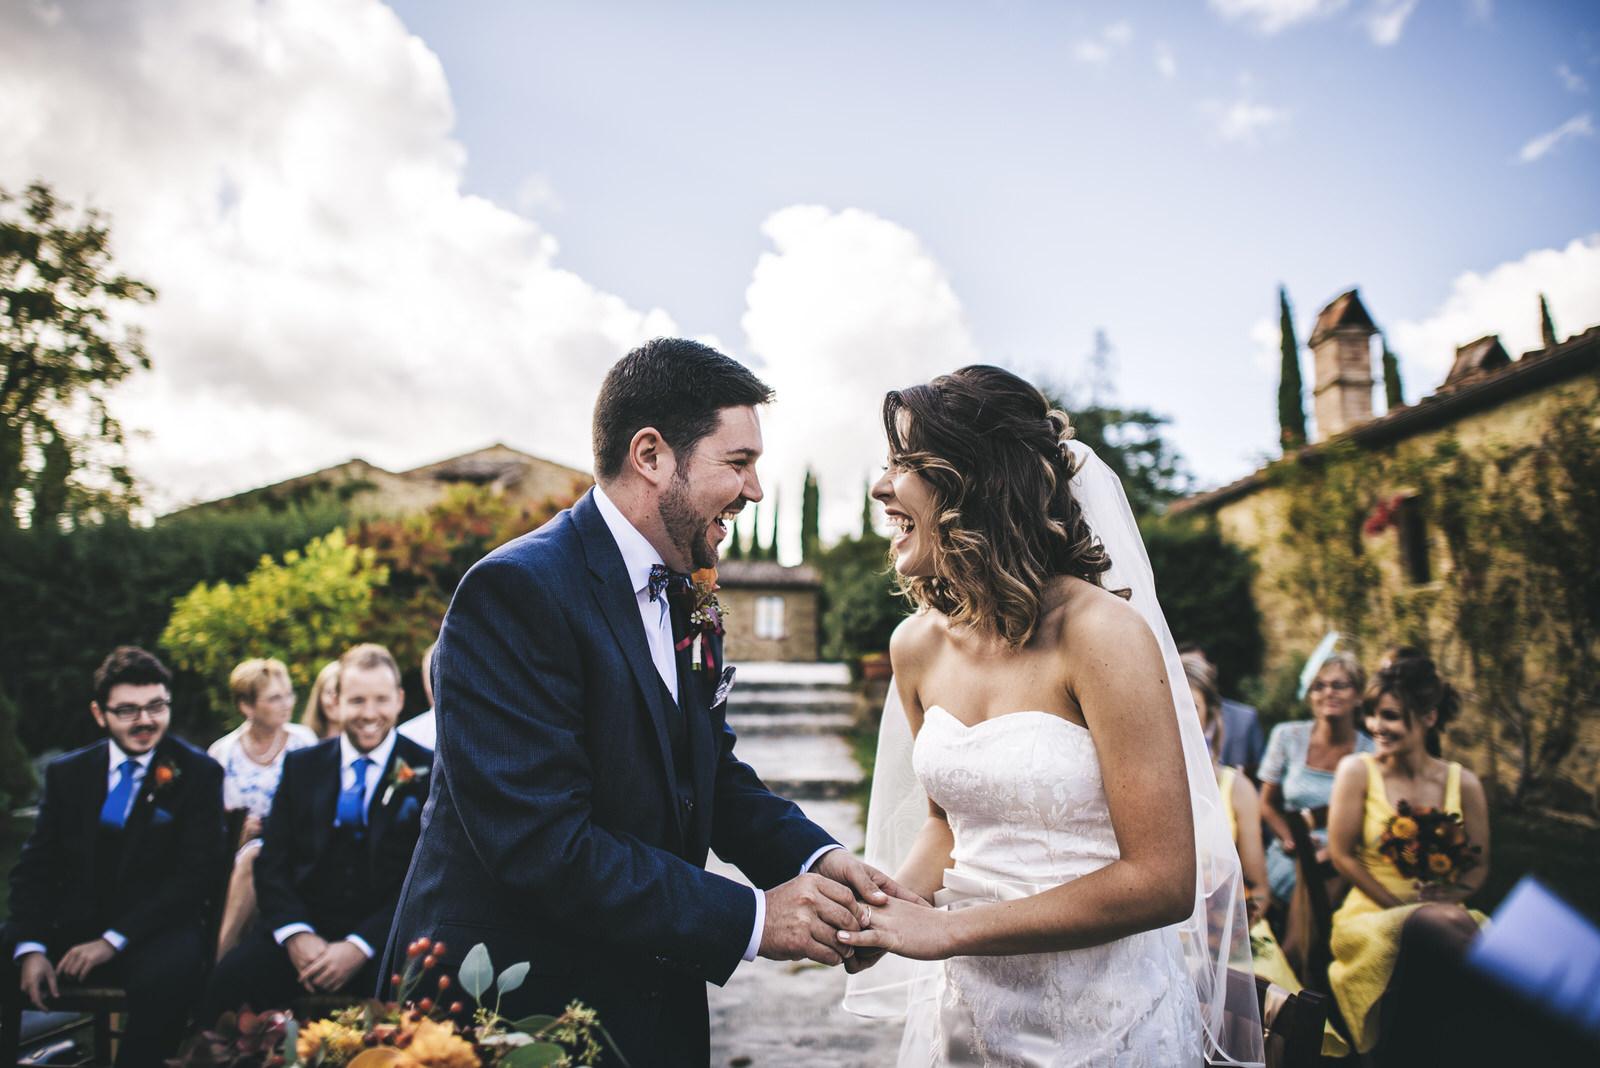 wedding photographer in italy-venice-tuscany-florence-amalfi coast-como lake-villa del balbianello-siena-amalfi-ravello-belmond-villa cimbrone36